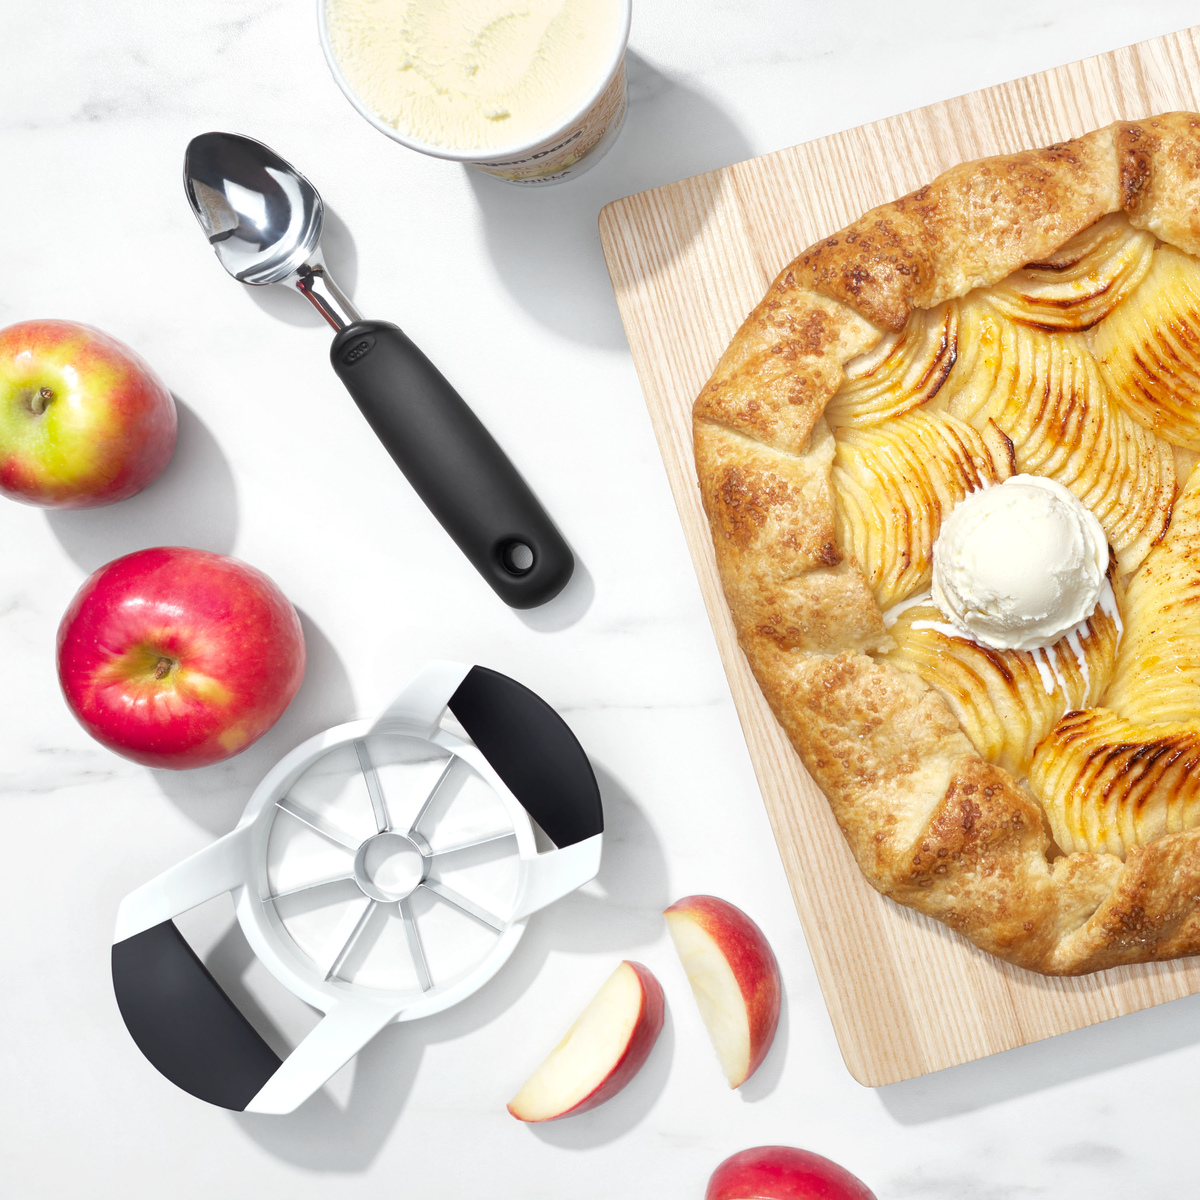 Нож для яблок OXO FRUIT & VEGETABLES, 11х6х22 см, белый OXO 32681 фото 6